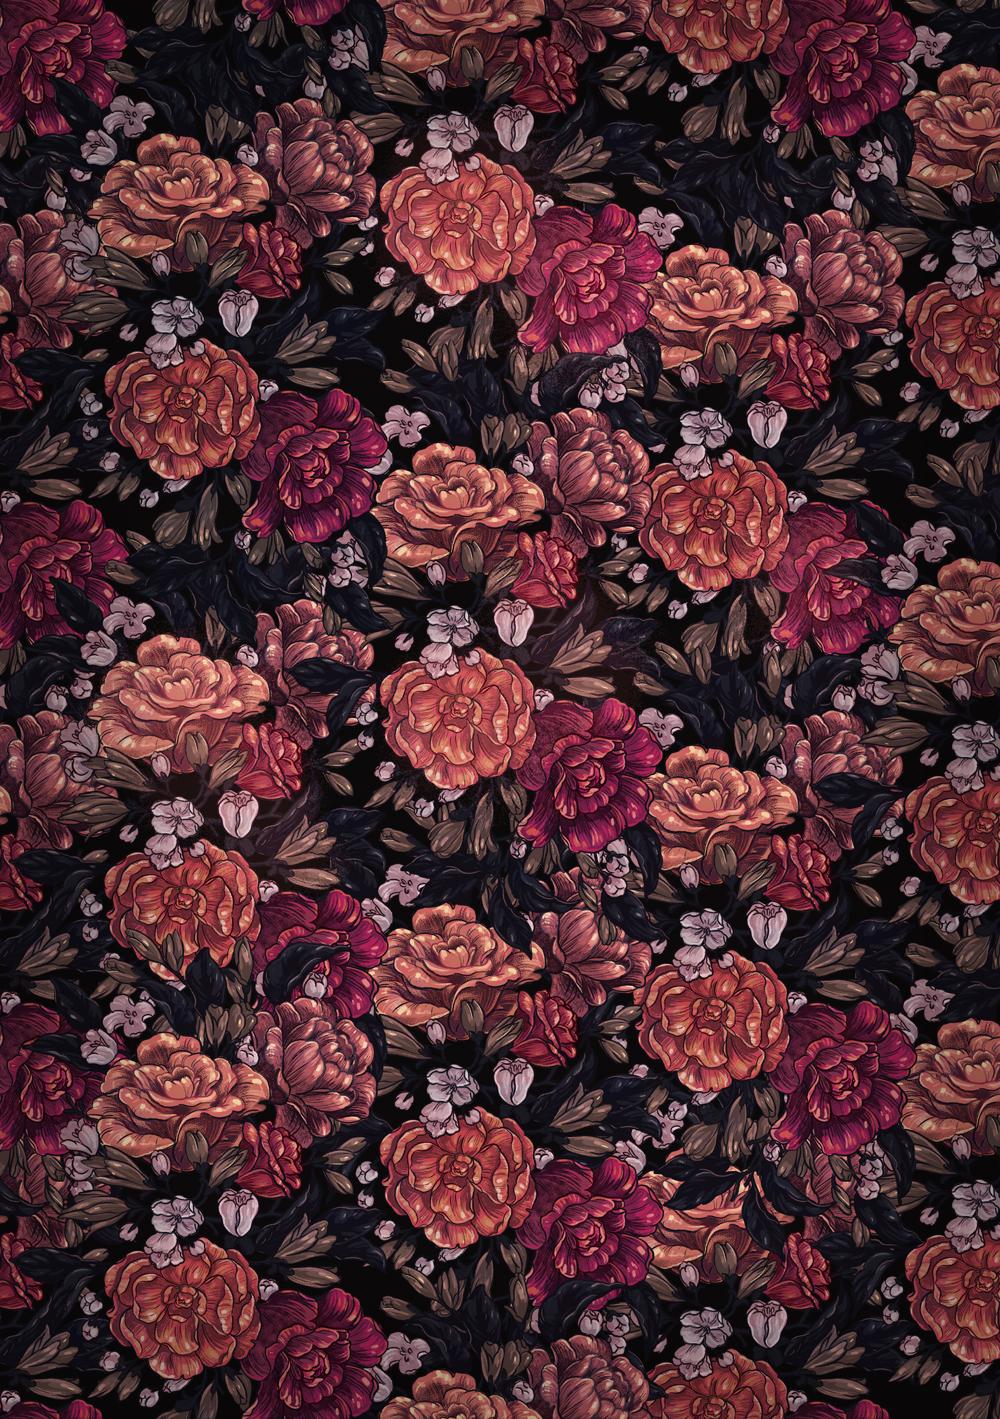 rosepattern_dark_1000px.jpg